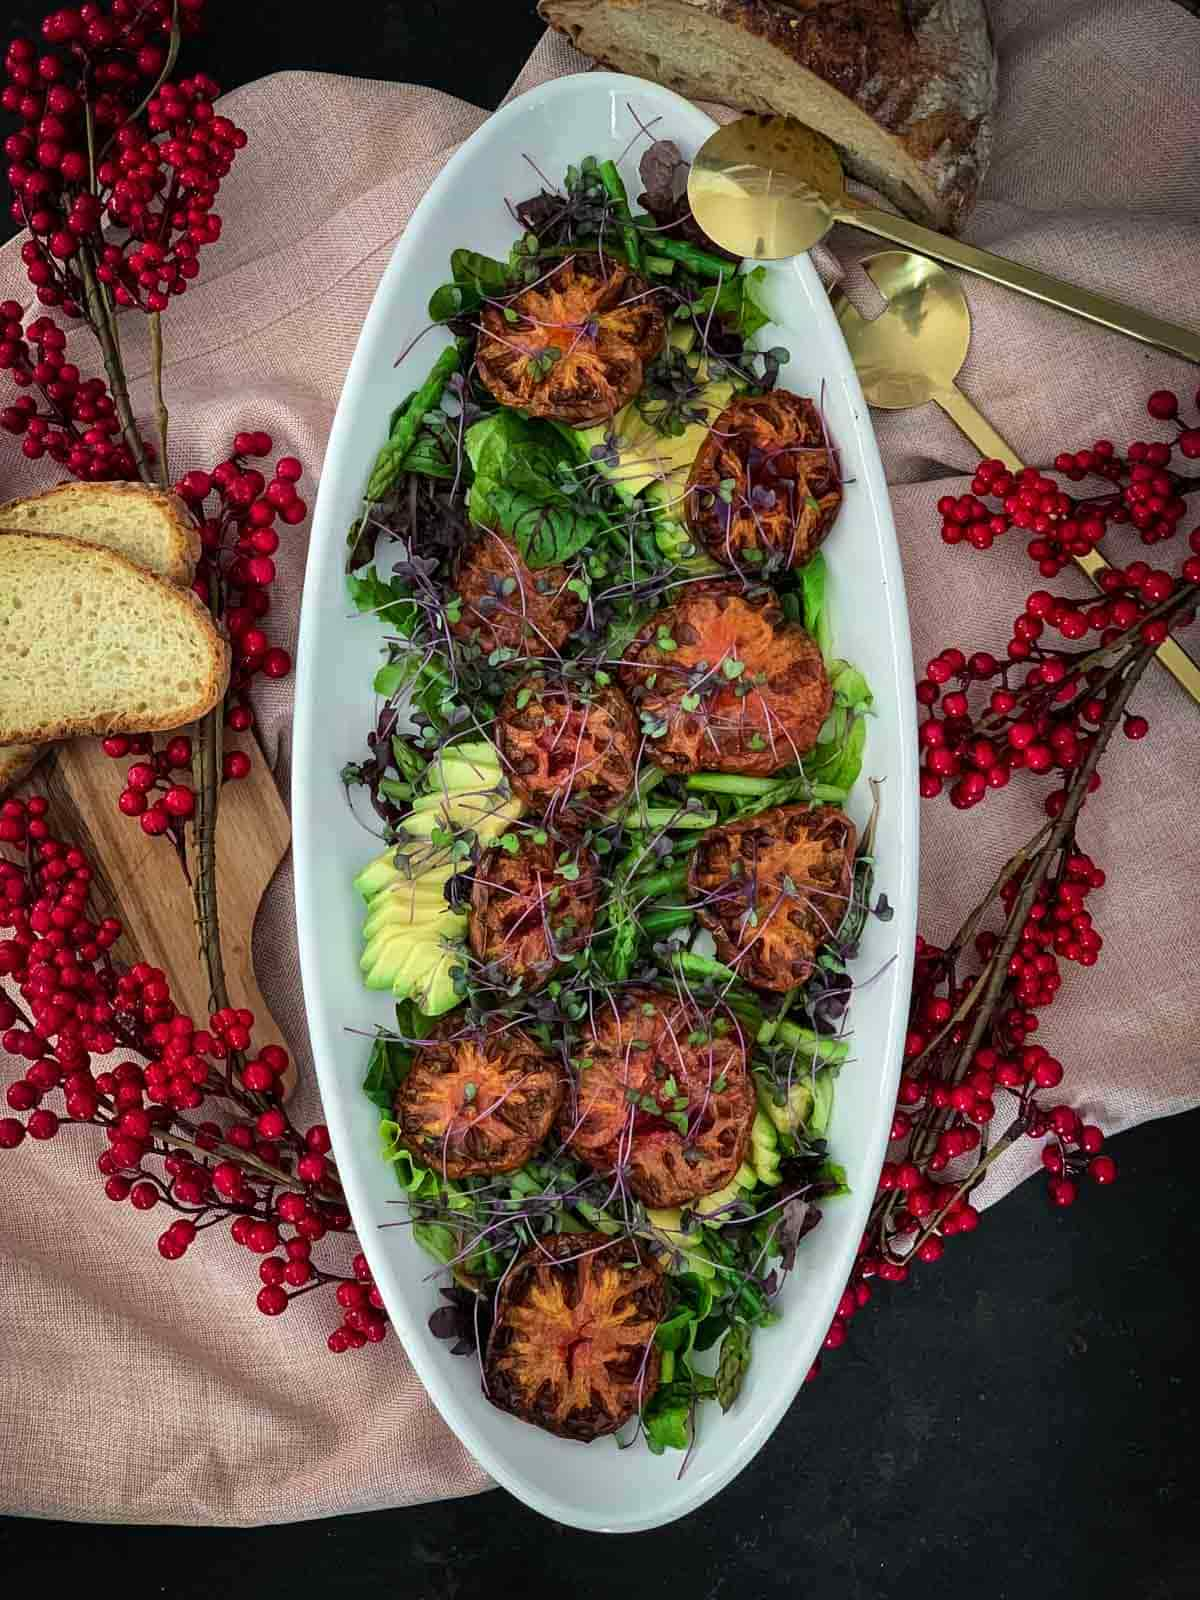 Christmas Salad with Heirloom Tomatoes and Asparagus